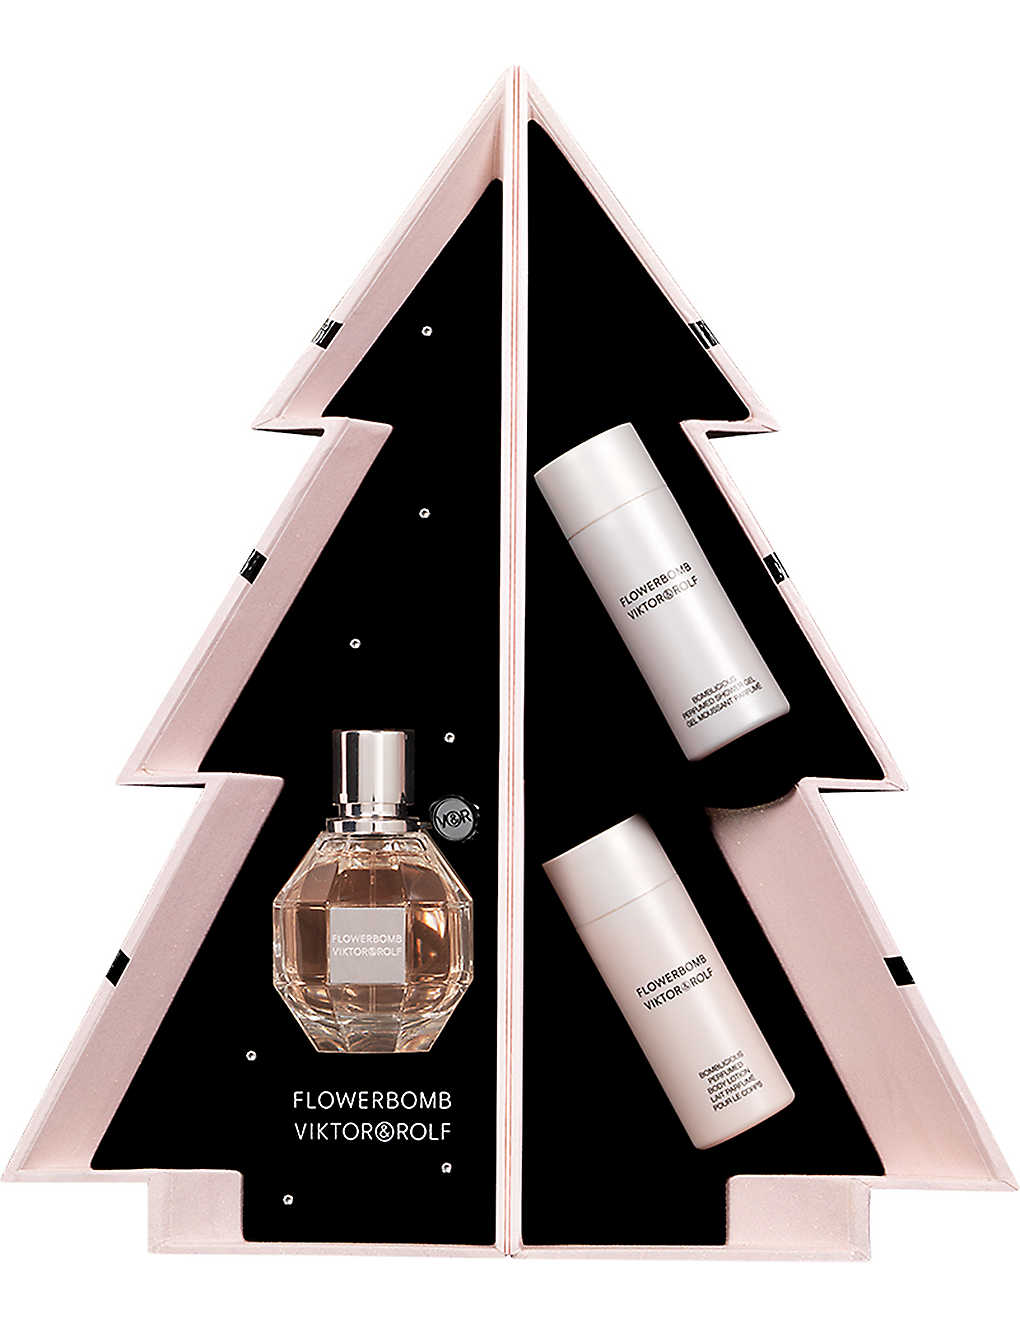 84dd433617fa VIKTOR   ROLF - Flowerbomb eau de parfum Christmas gift set ...